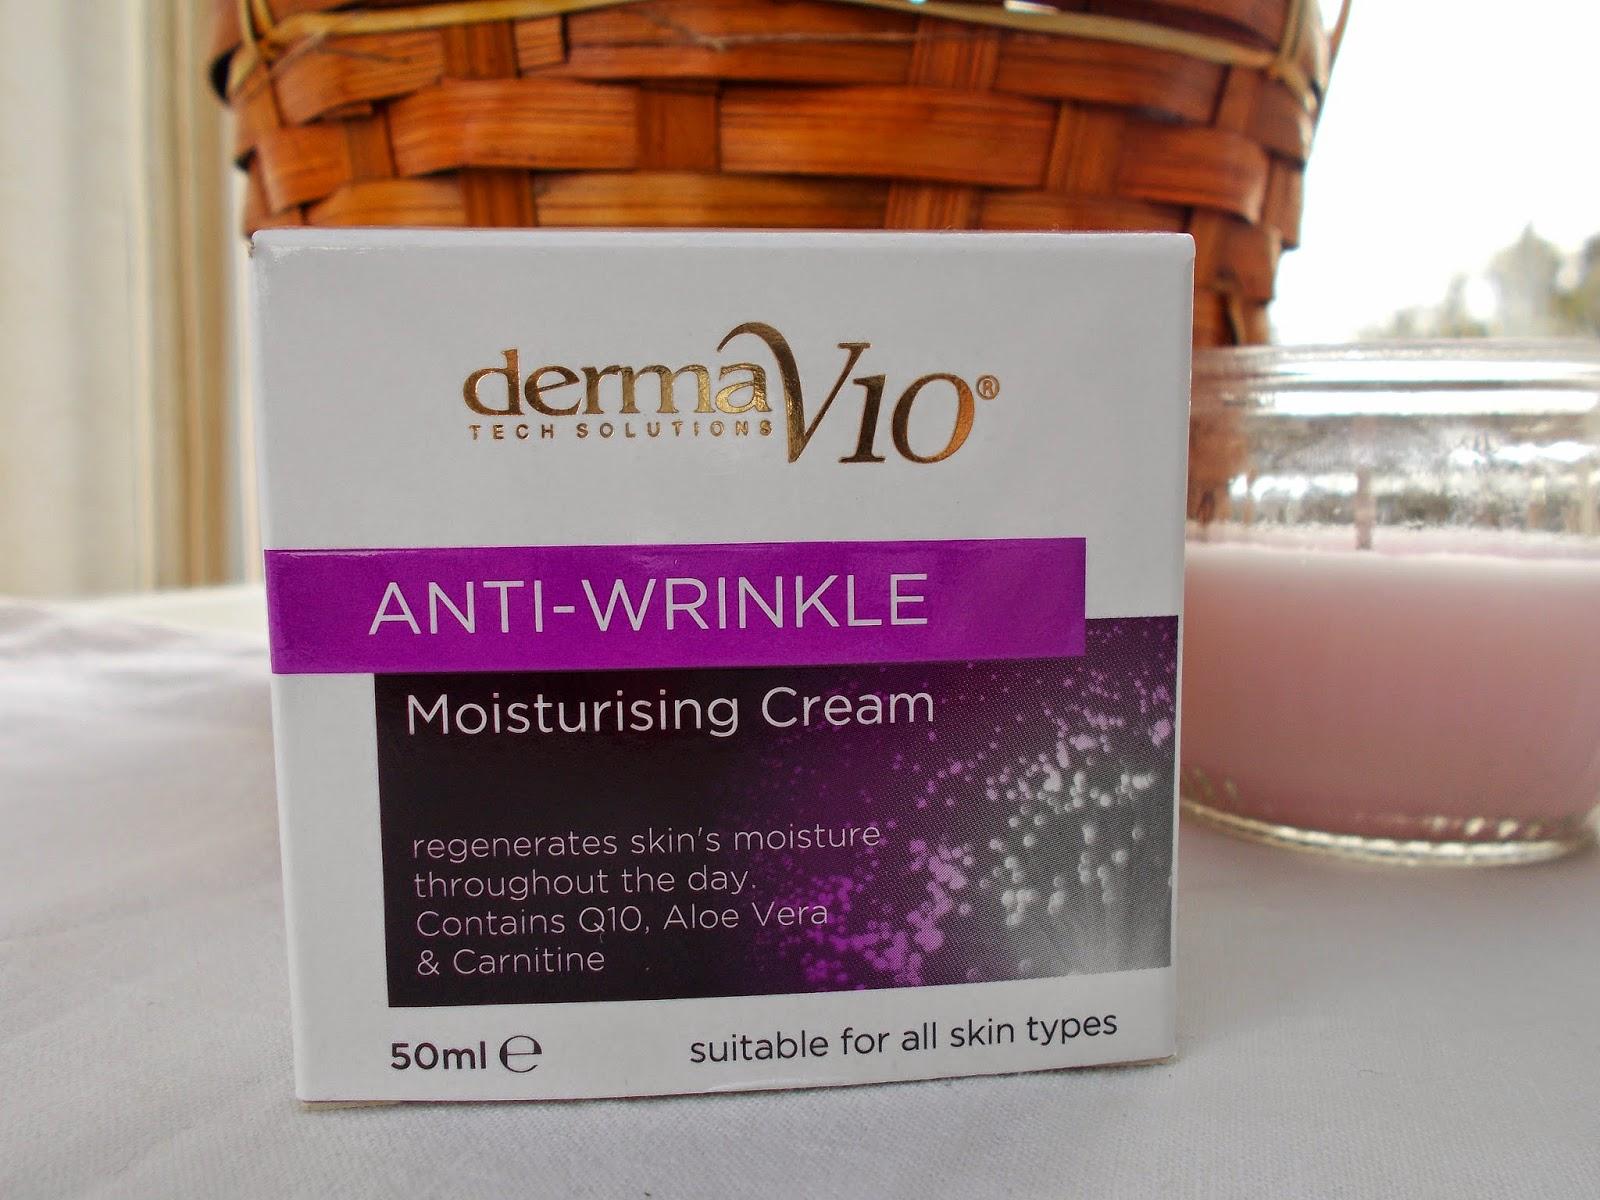 derma v10 anti wrinkle cream